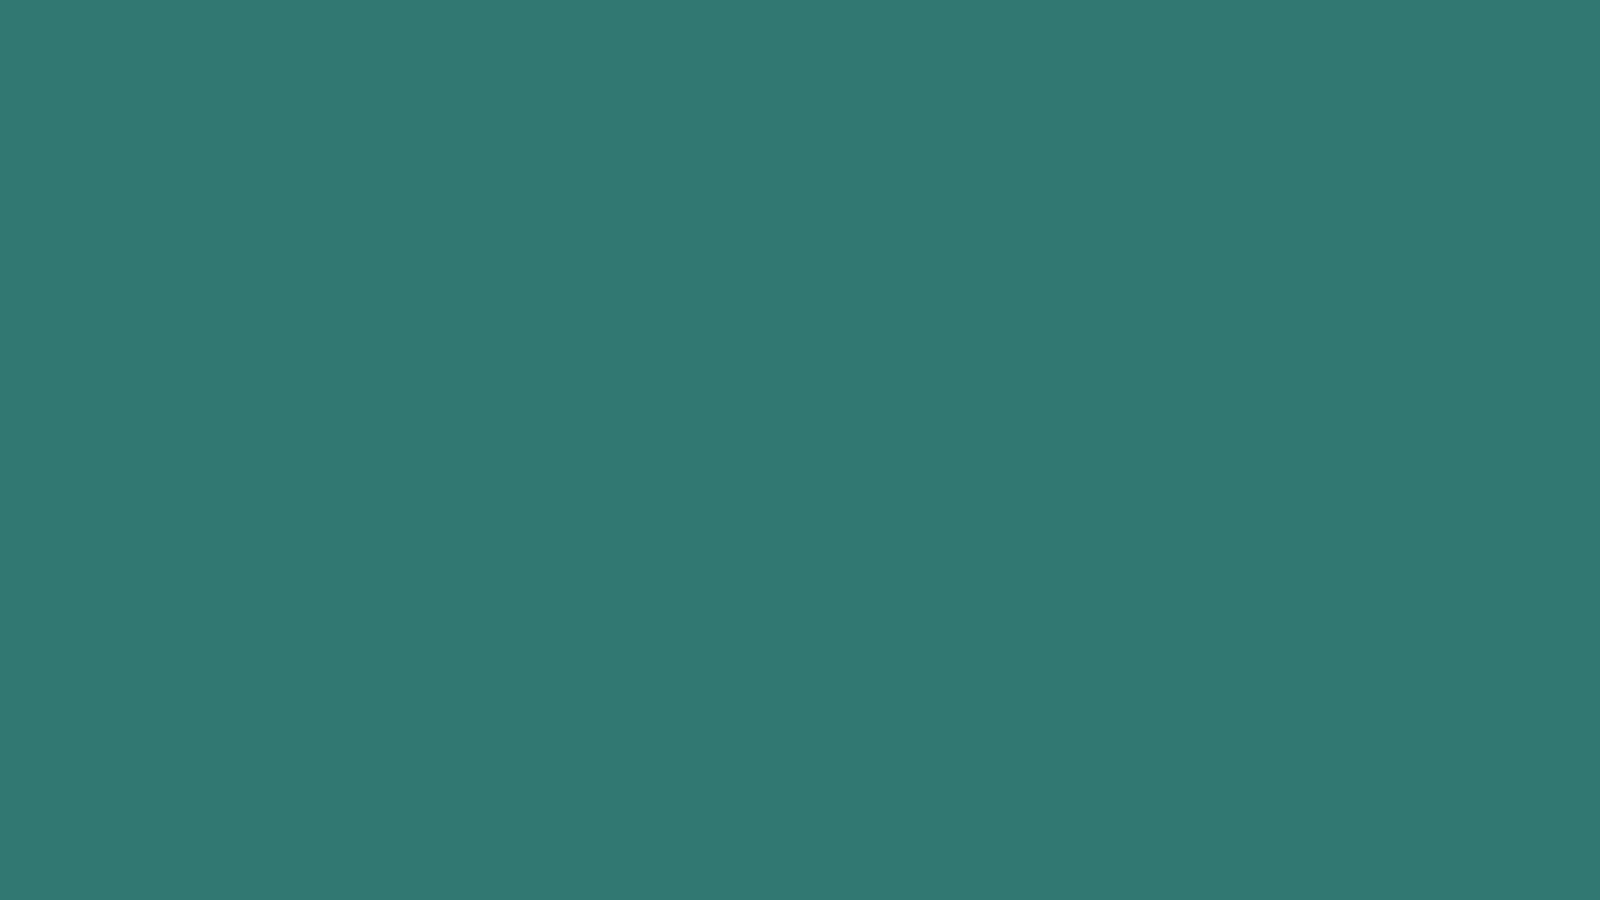 1600x900 Myrtle Green Solid Color Background